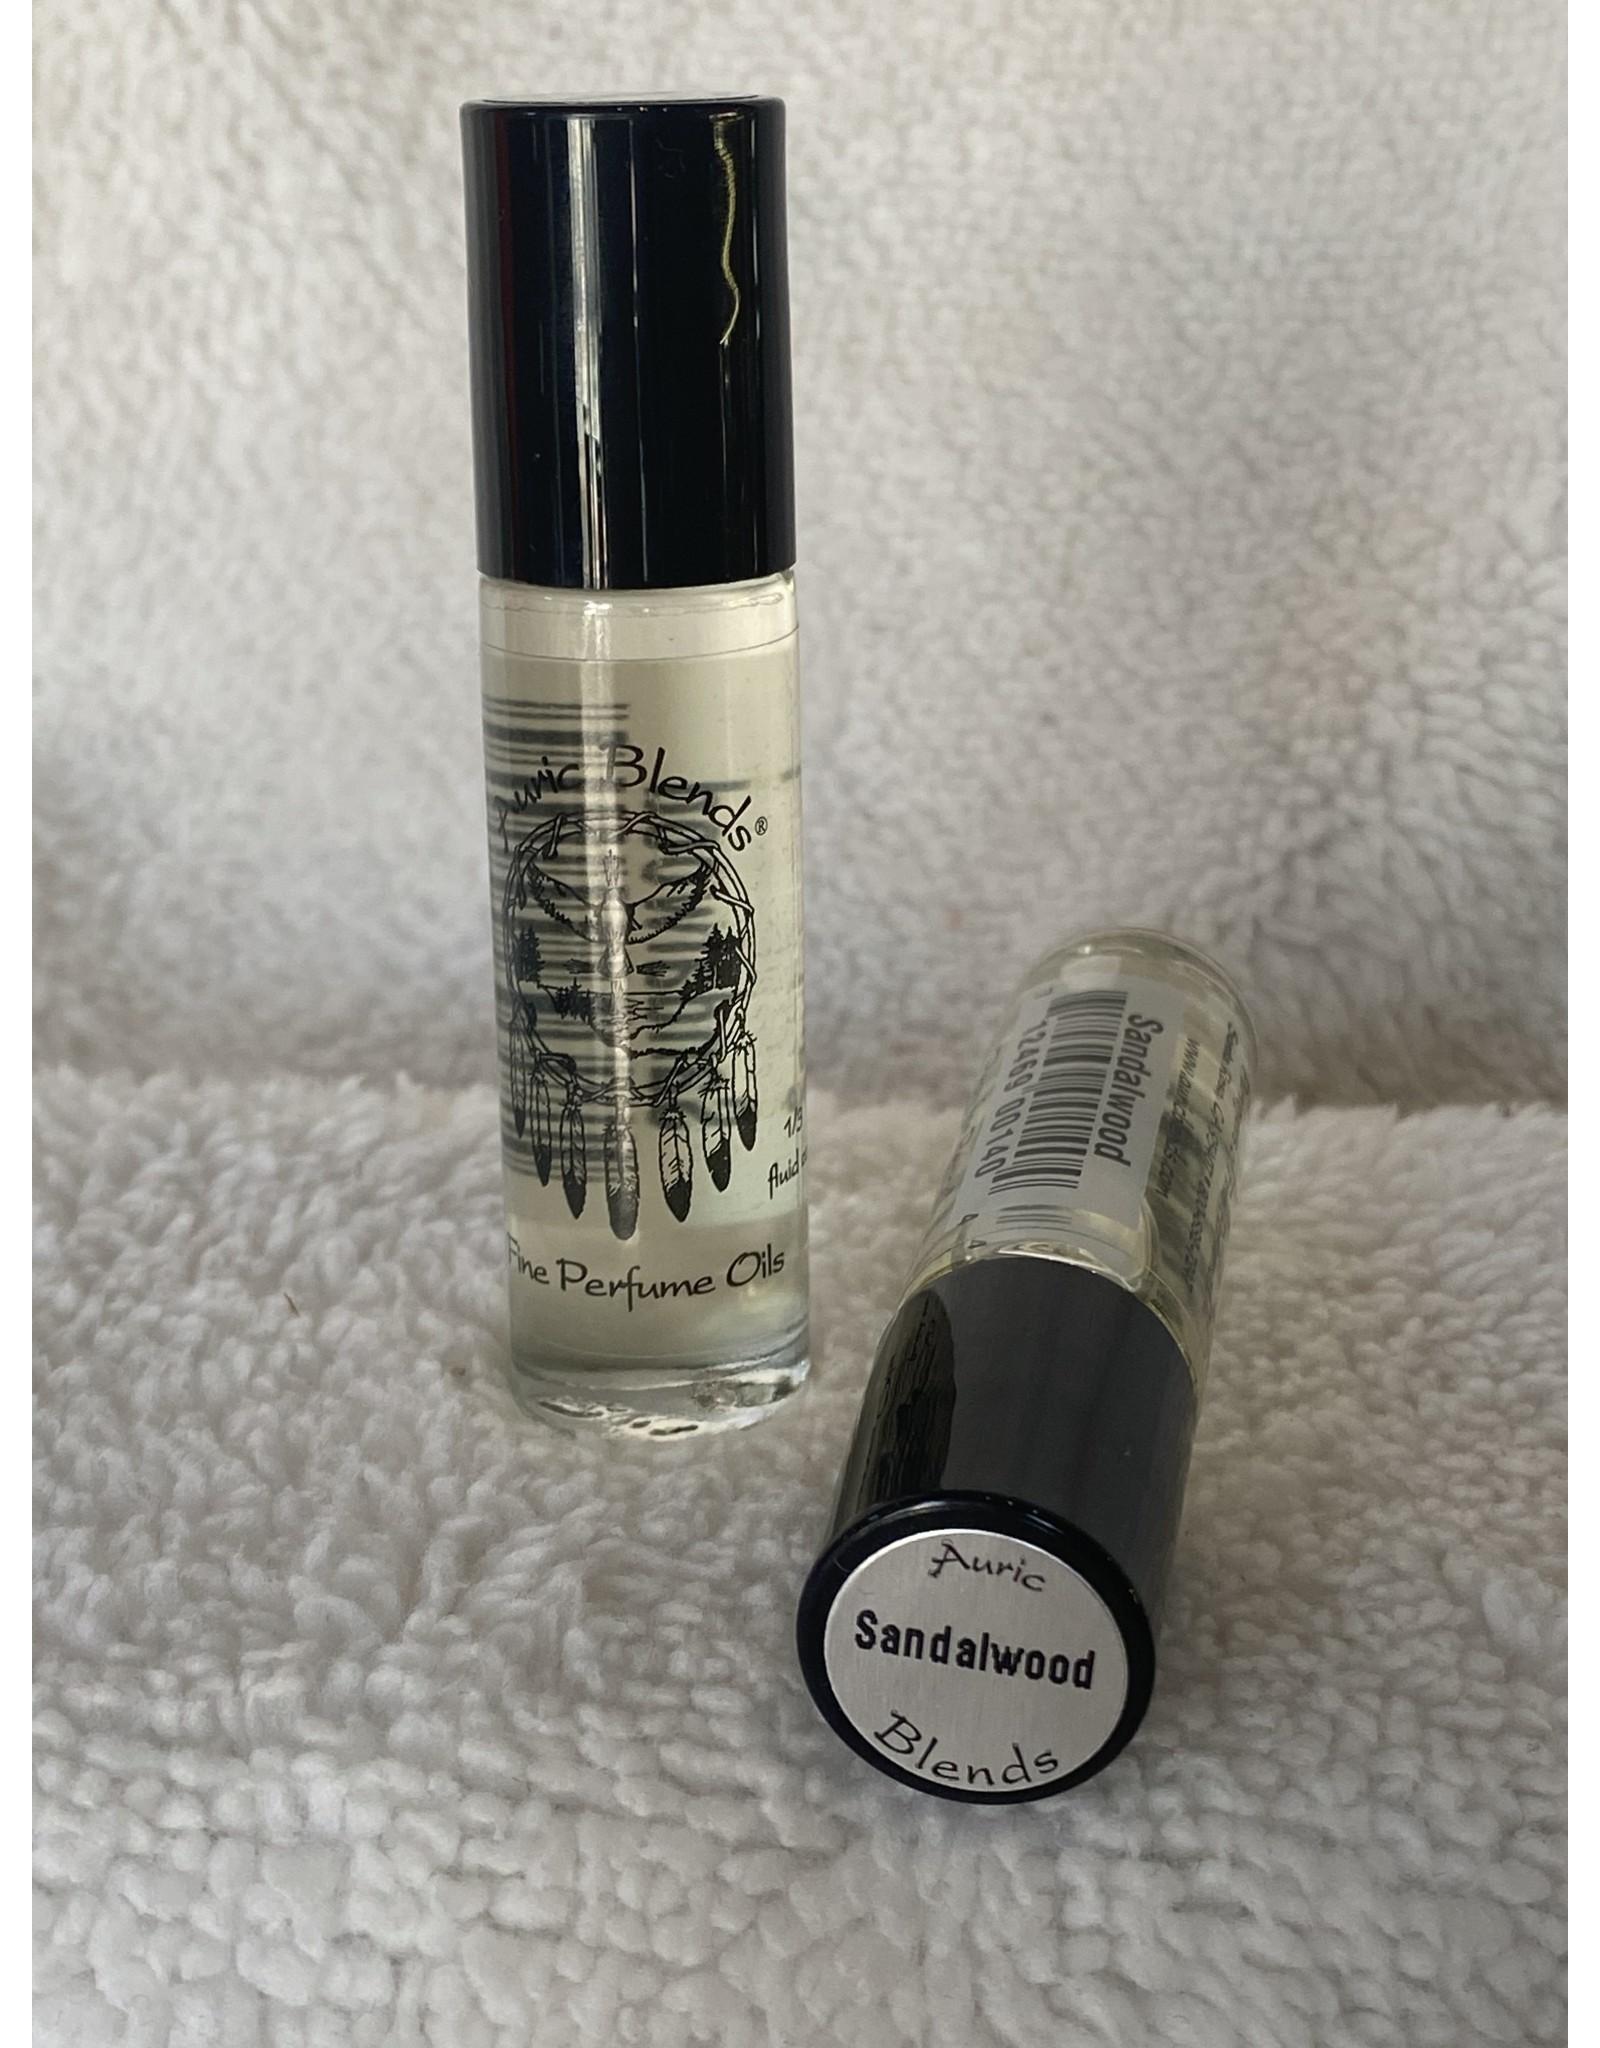 Auric Blends Perfume Roll-on | Sandalwood